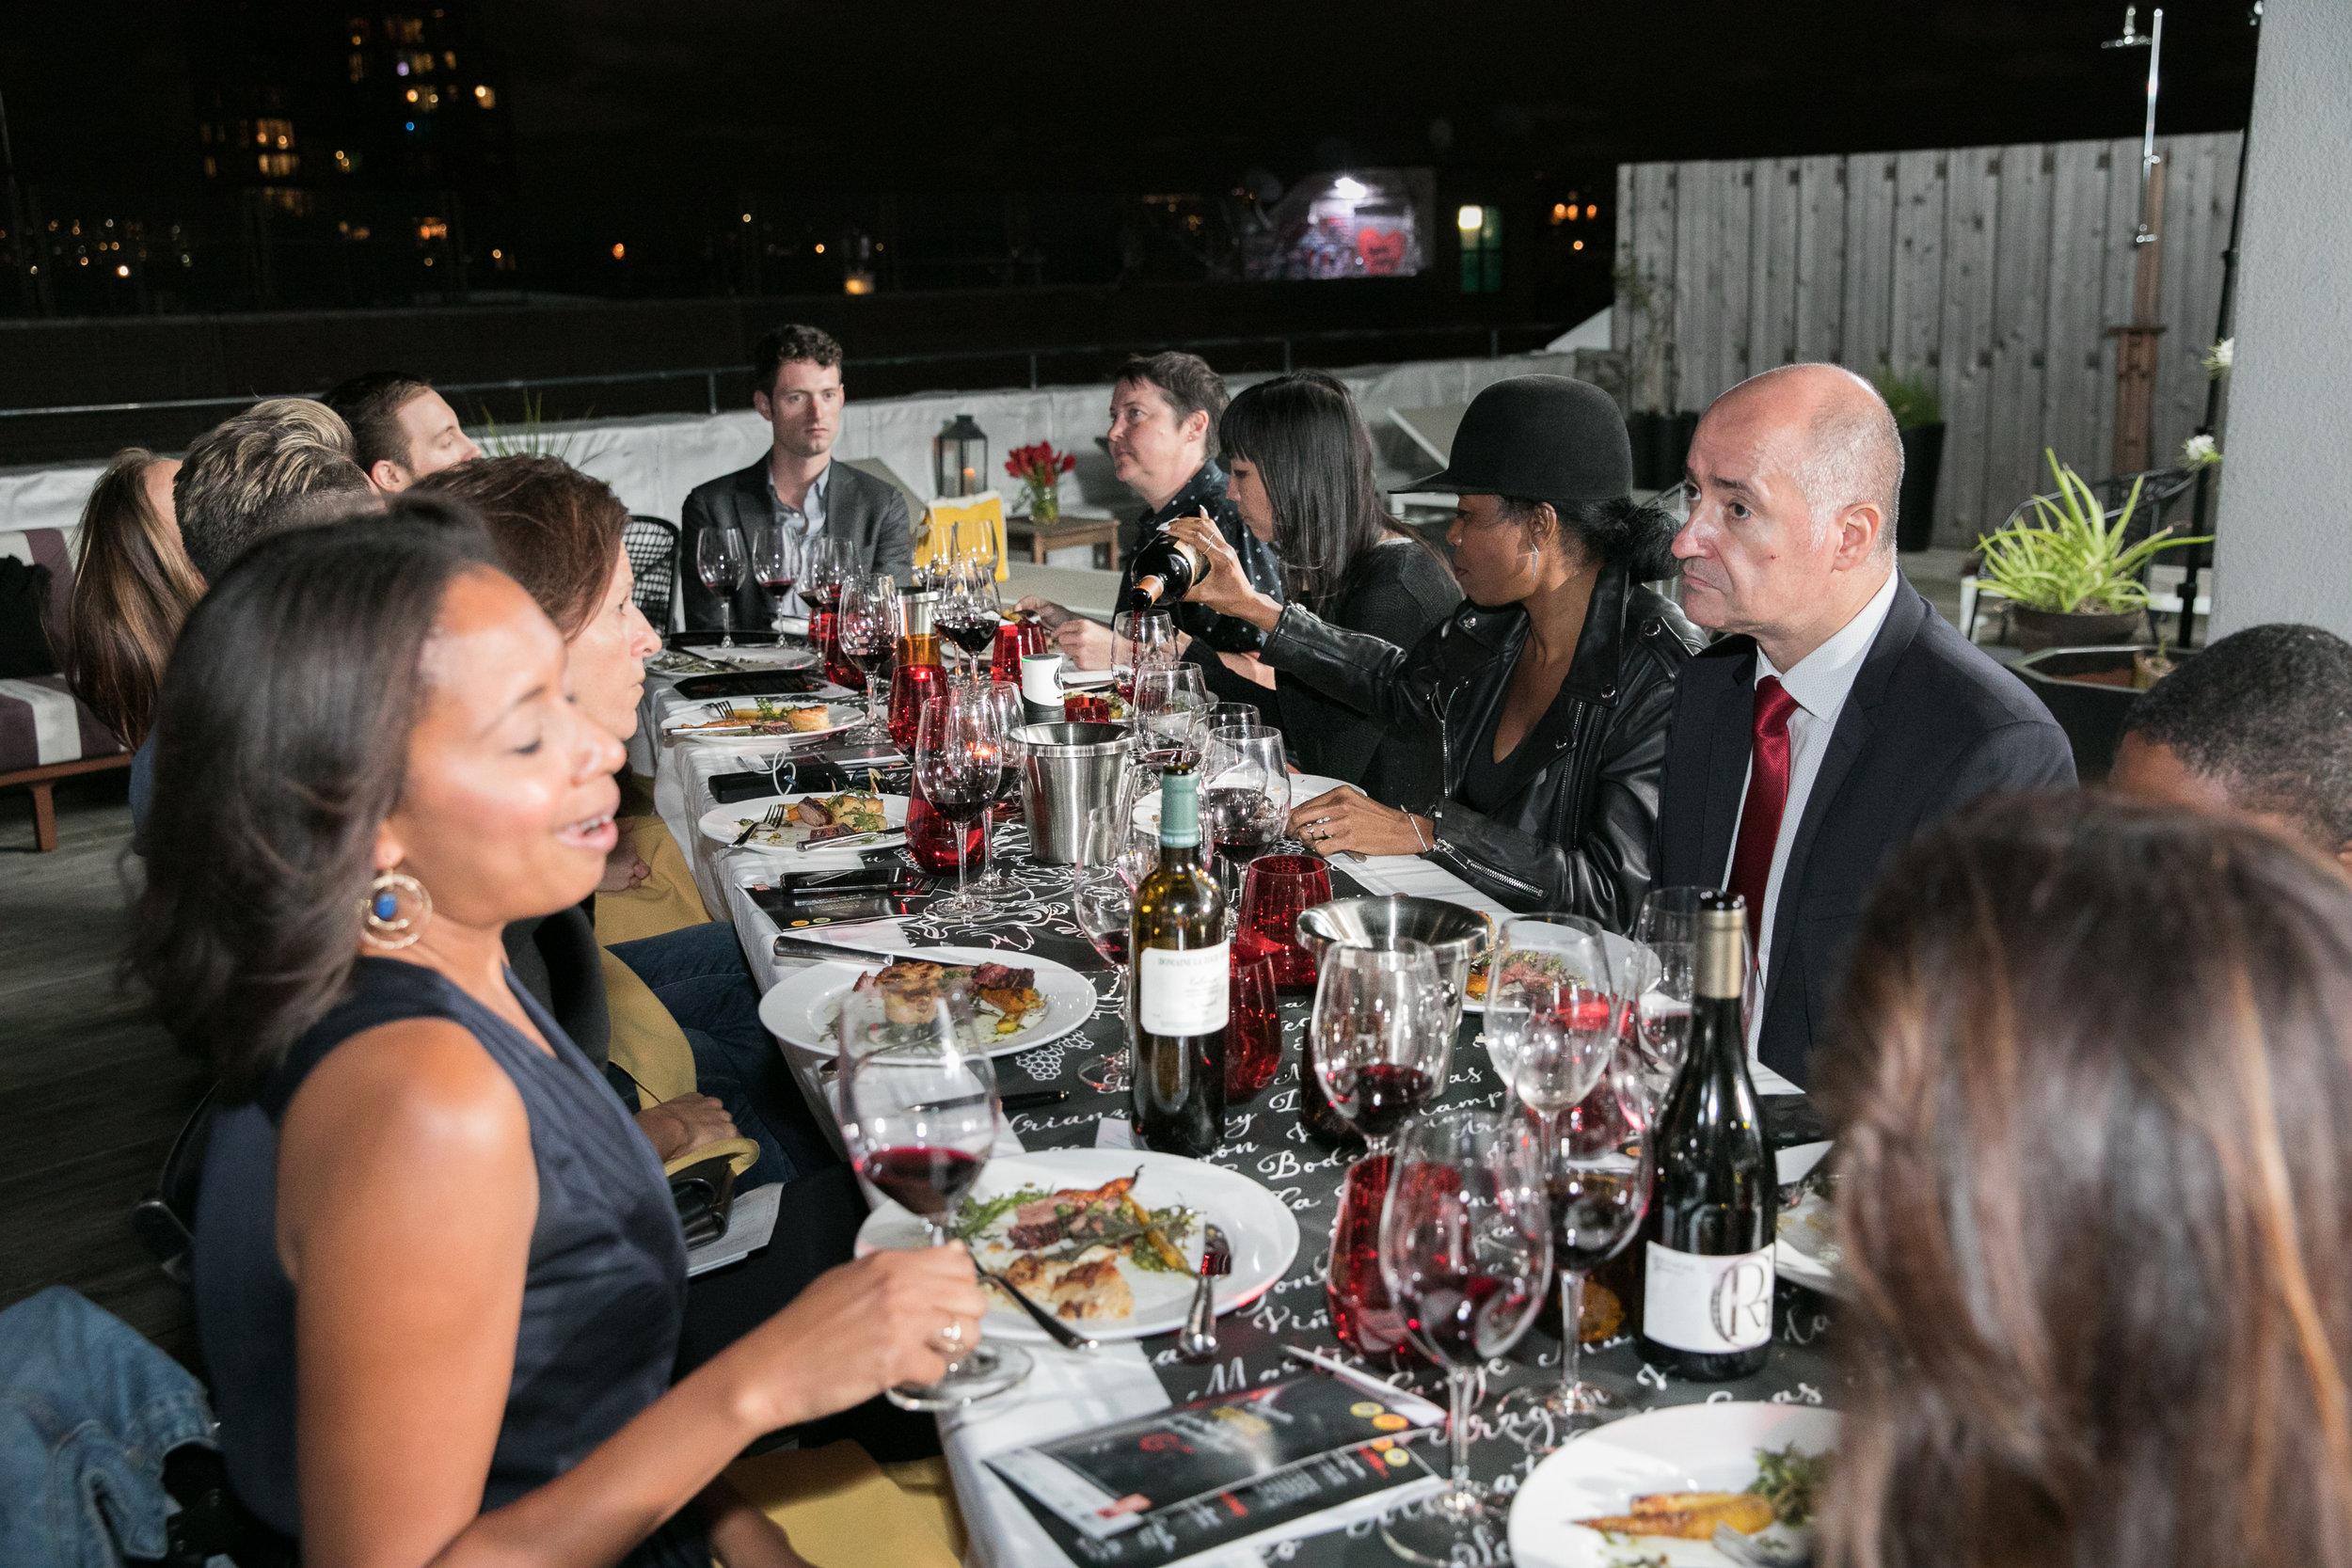 Table shot tasting reds-Garnacha-PressDinner-BrooklynRooftop-2H9A0155.JPG